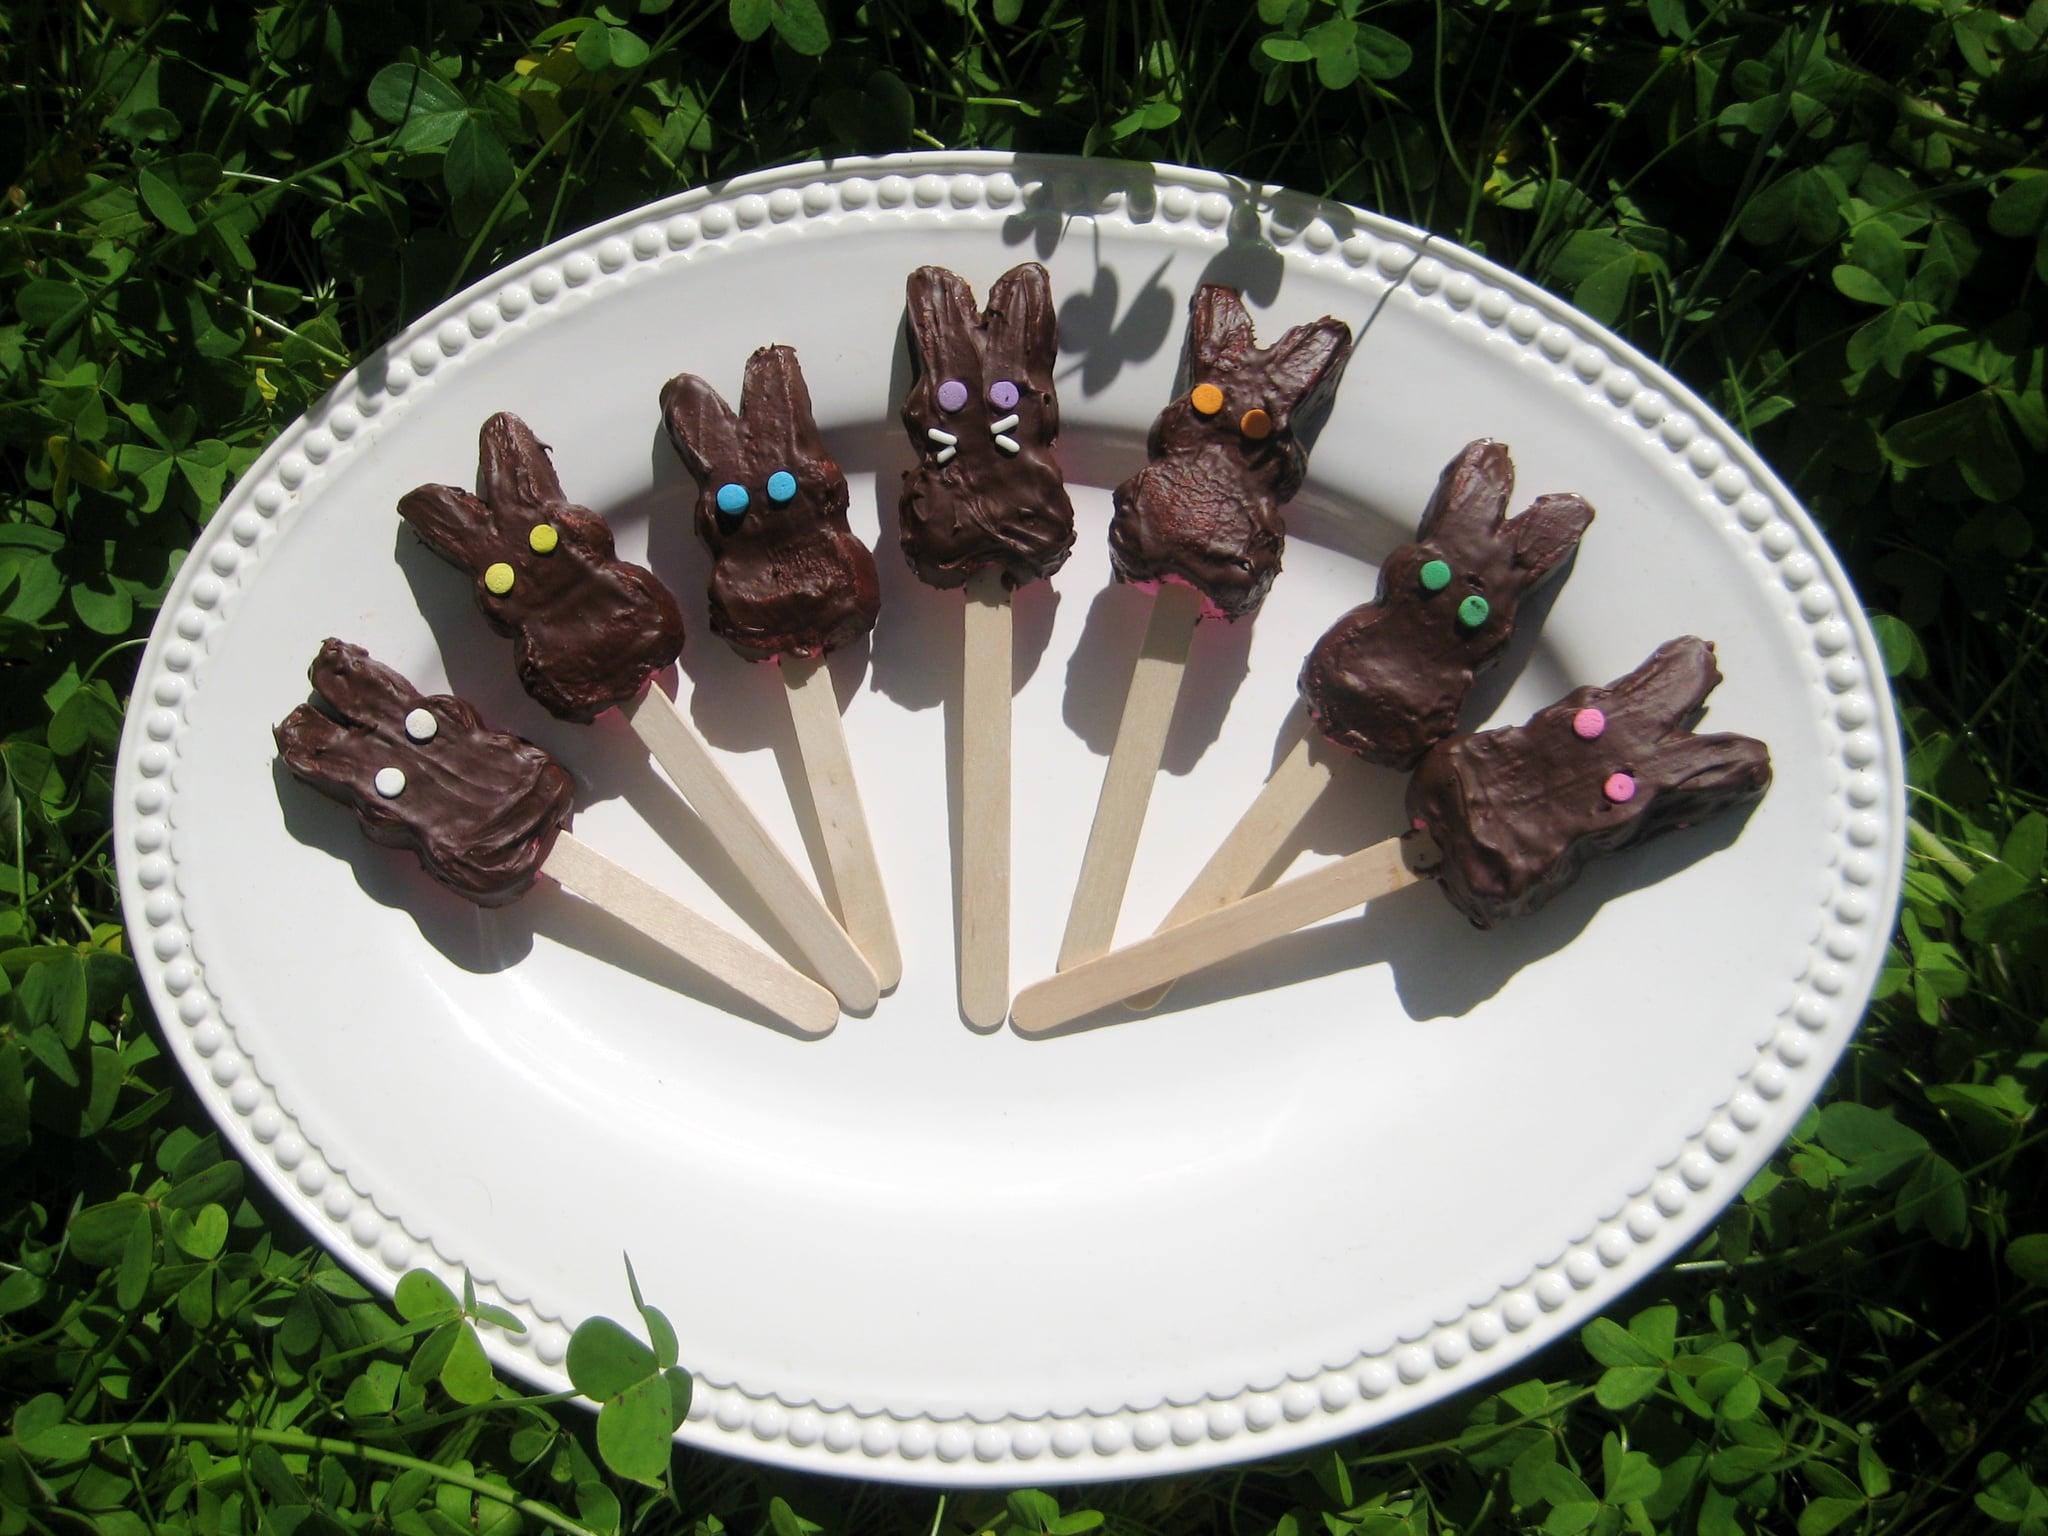 Chocolate-Covered Peeps